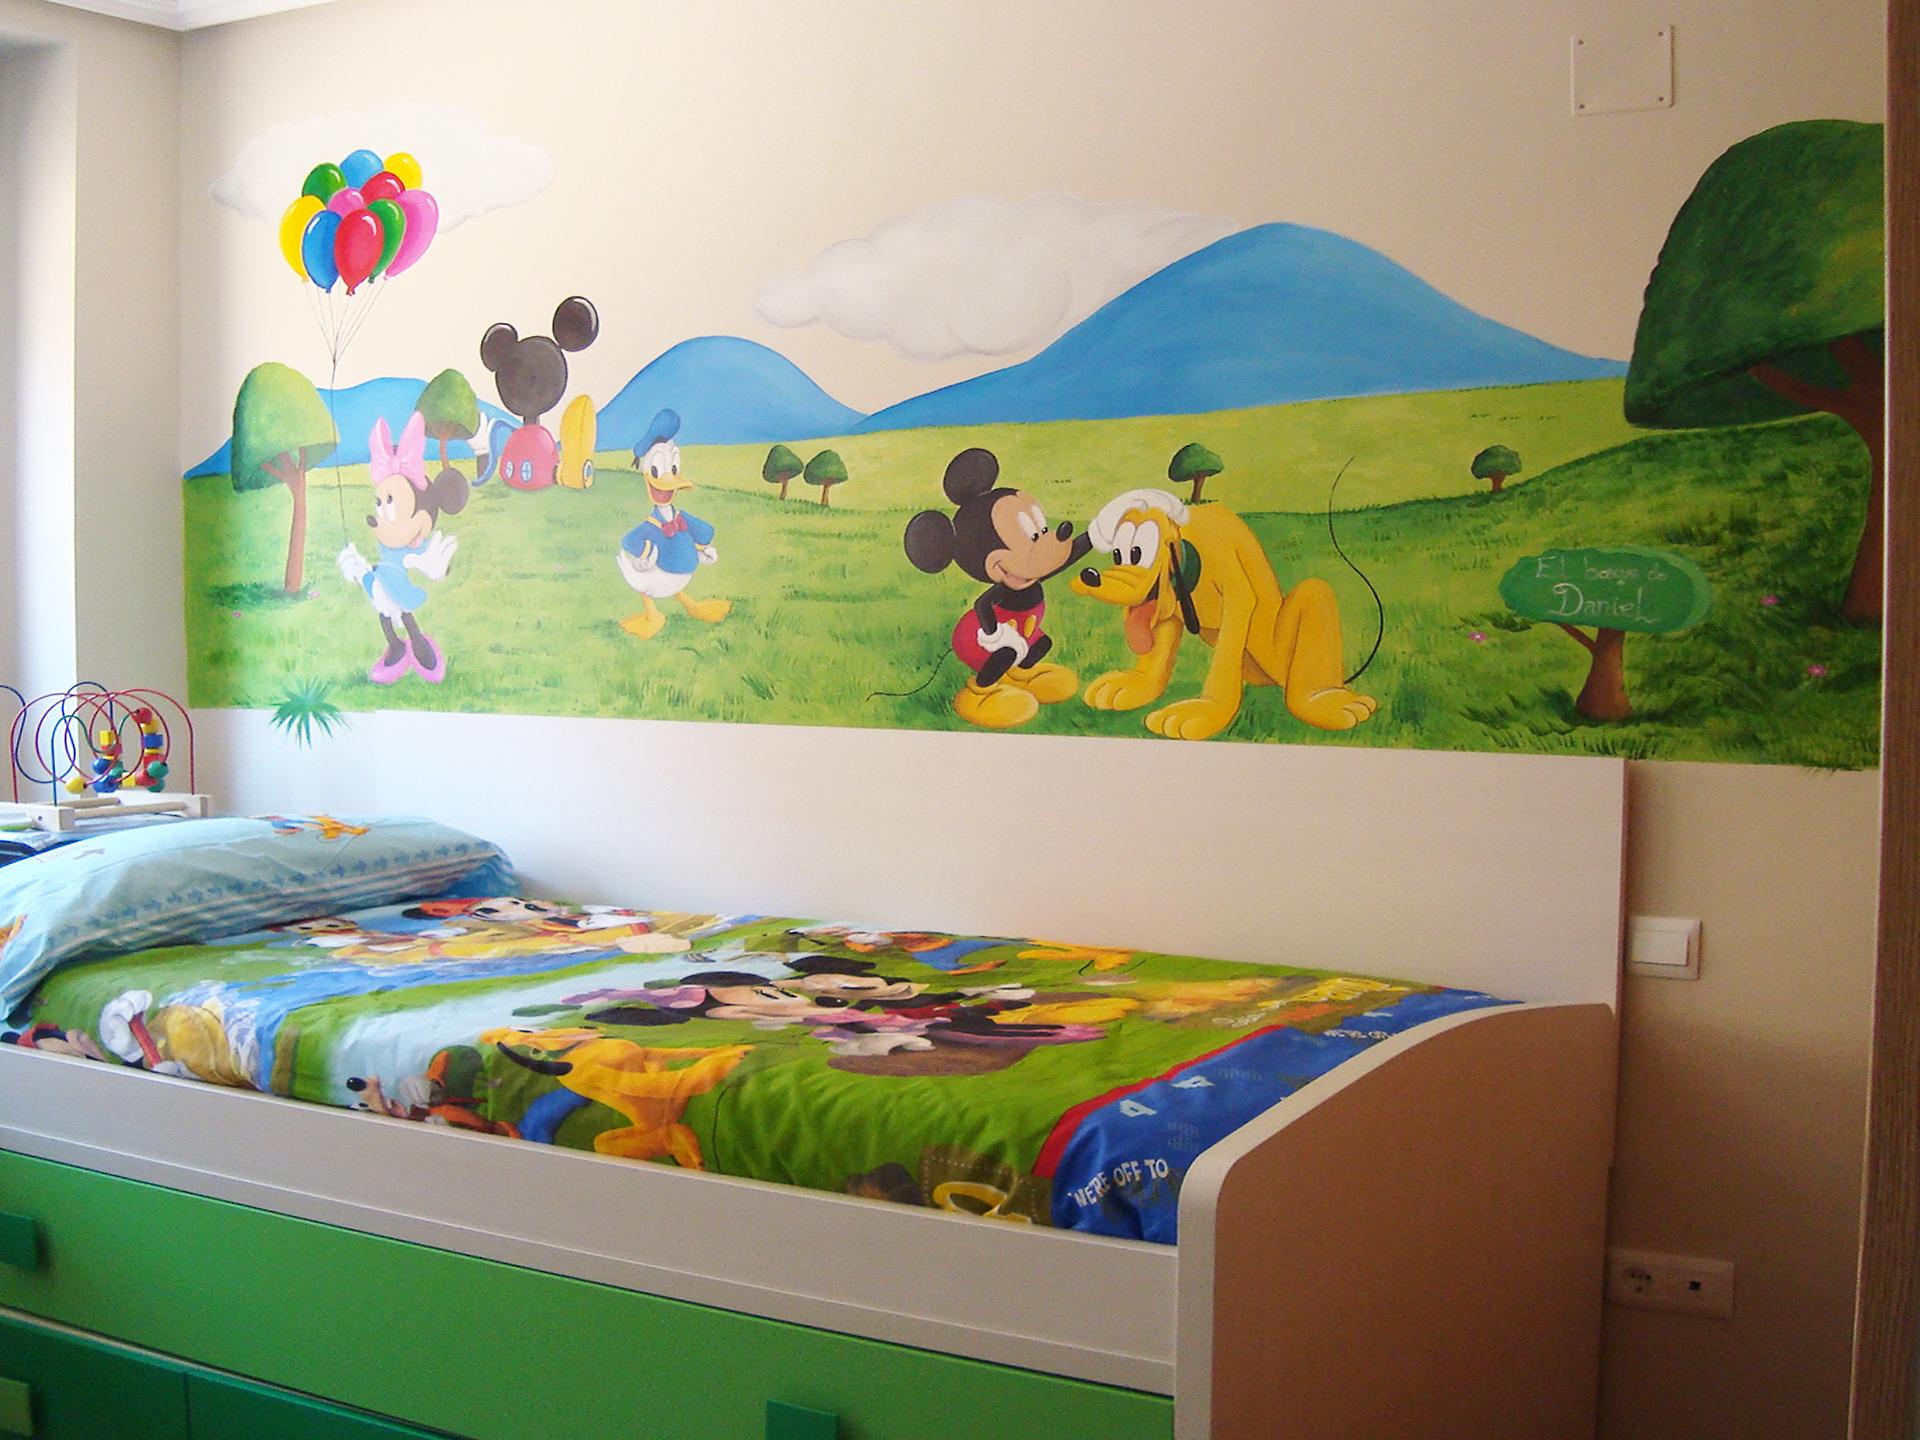 Paula m nguez cuadros infantiles pintados a mano cuadros - Cuadros habitacion nino ...